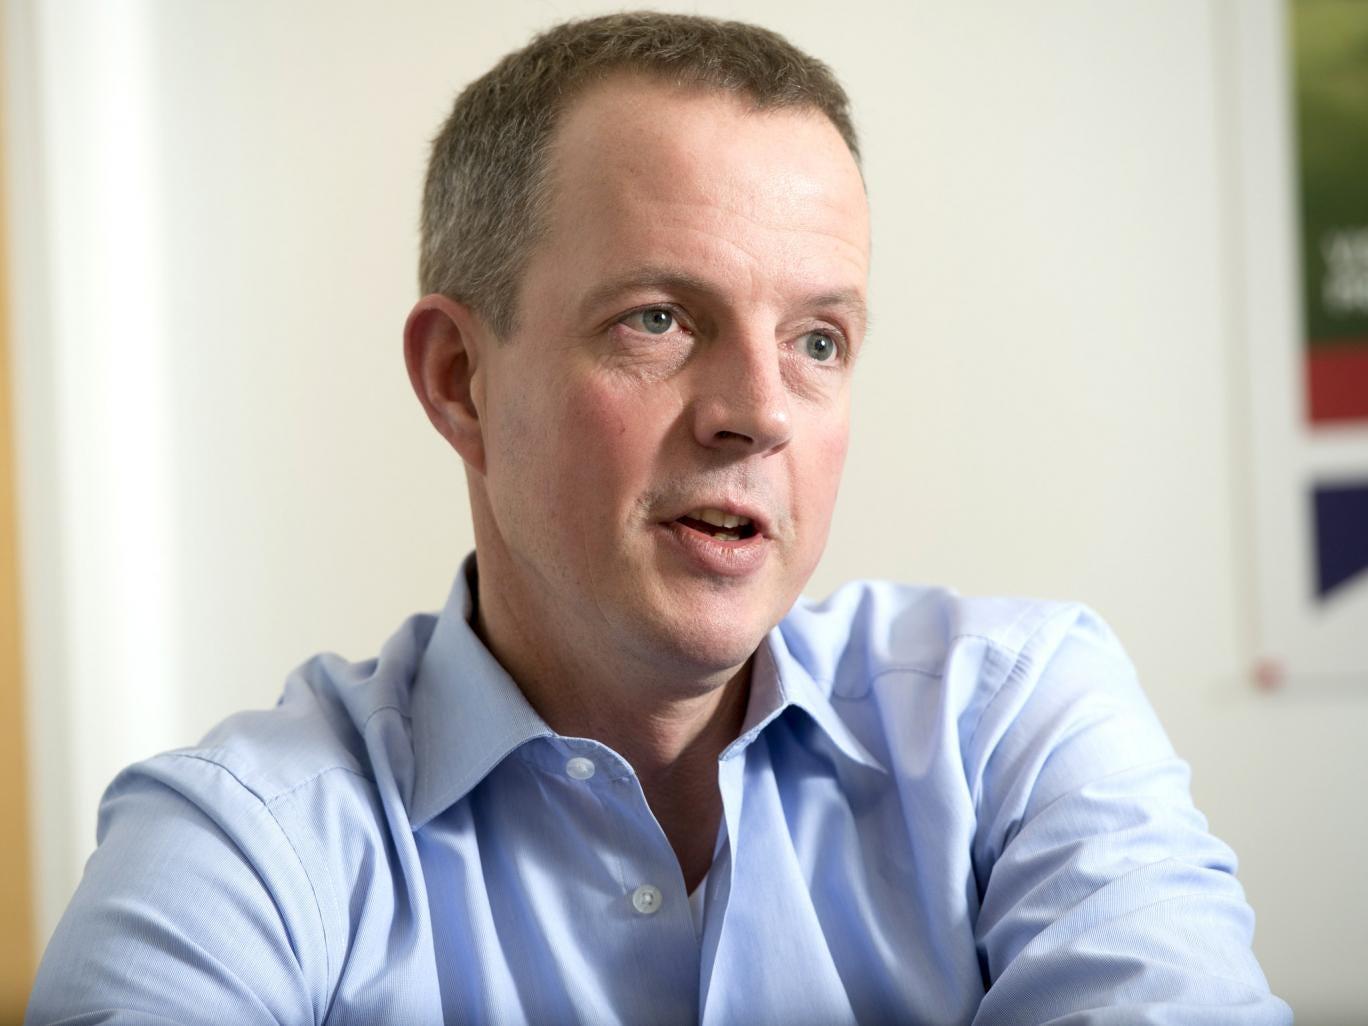 Nick Boles, business minister